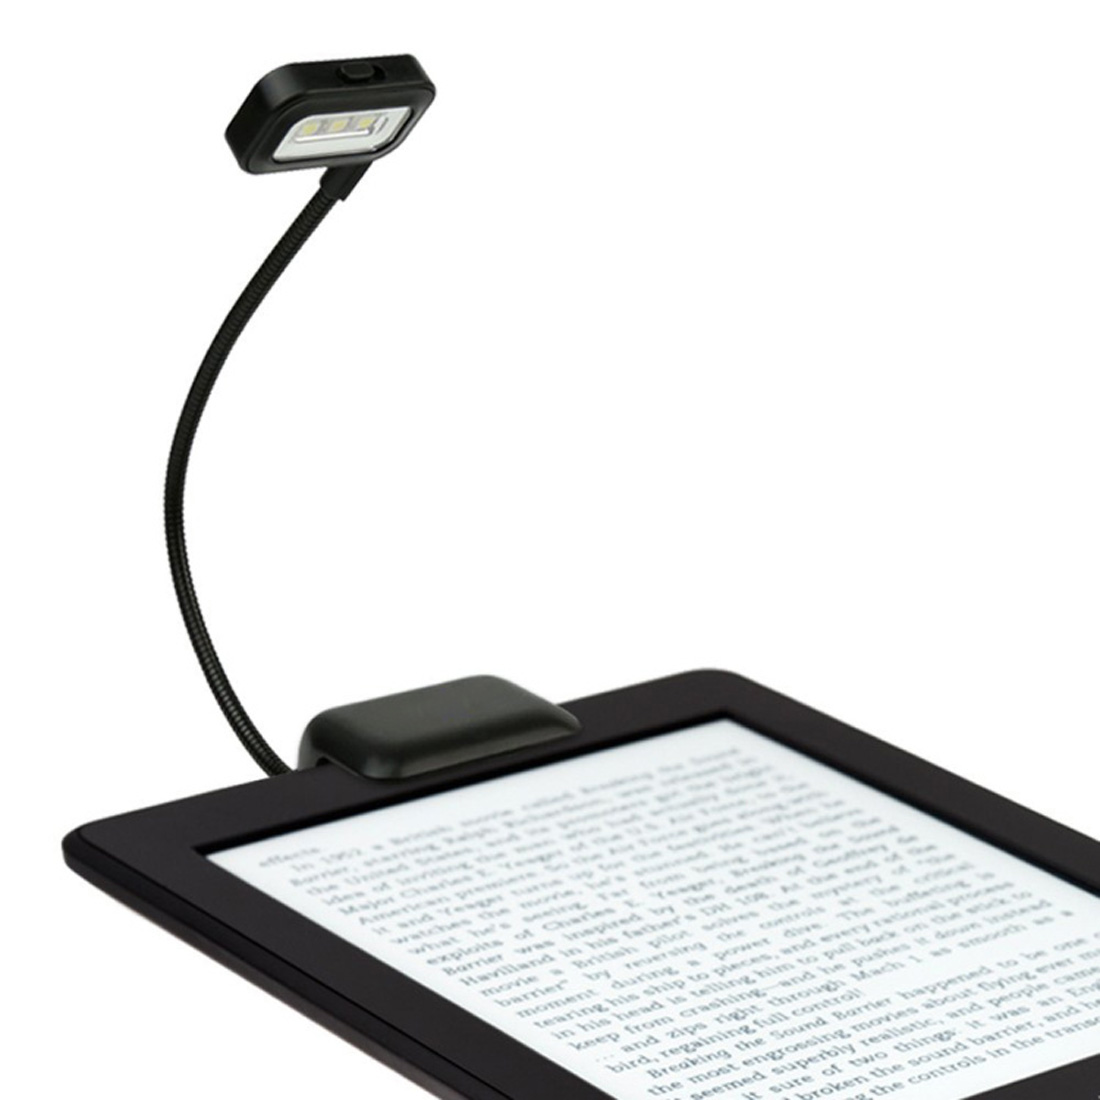 Warehouse Reading Light: Aliexpress.com : Buy Flexible Mini Clip Portable Lamp 0.5W